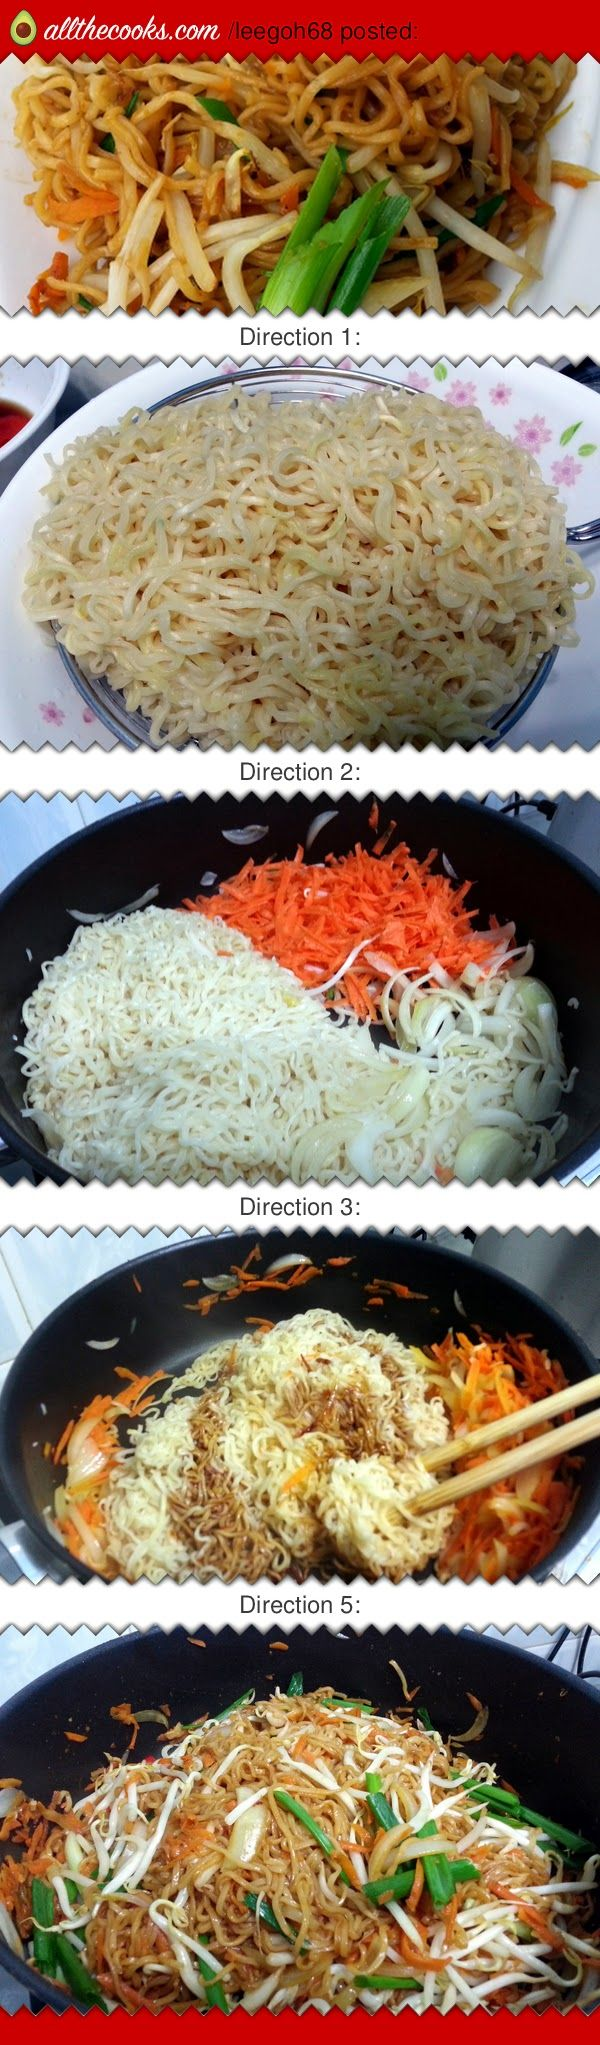 Lazy Stir Fry Chow Mein Noodles